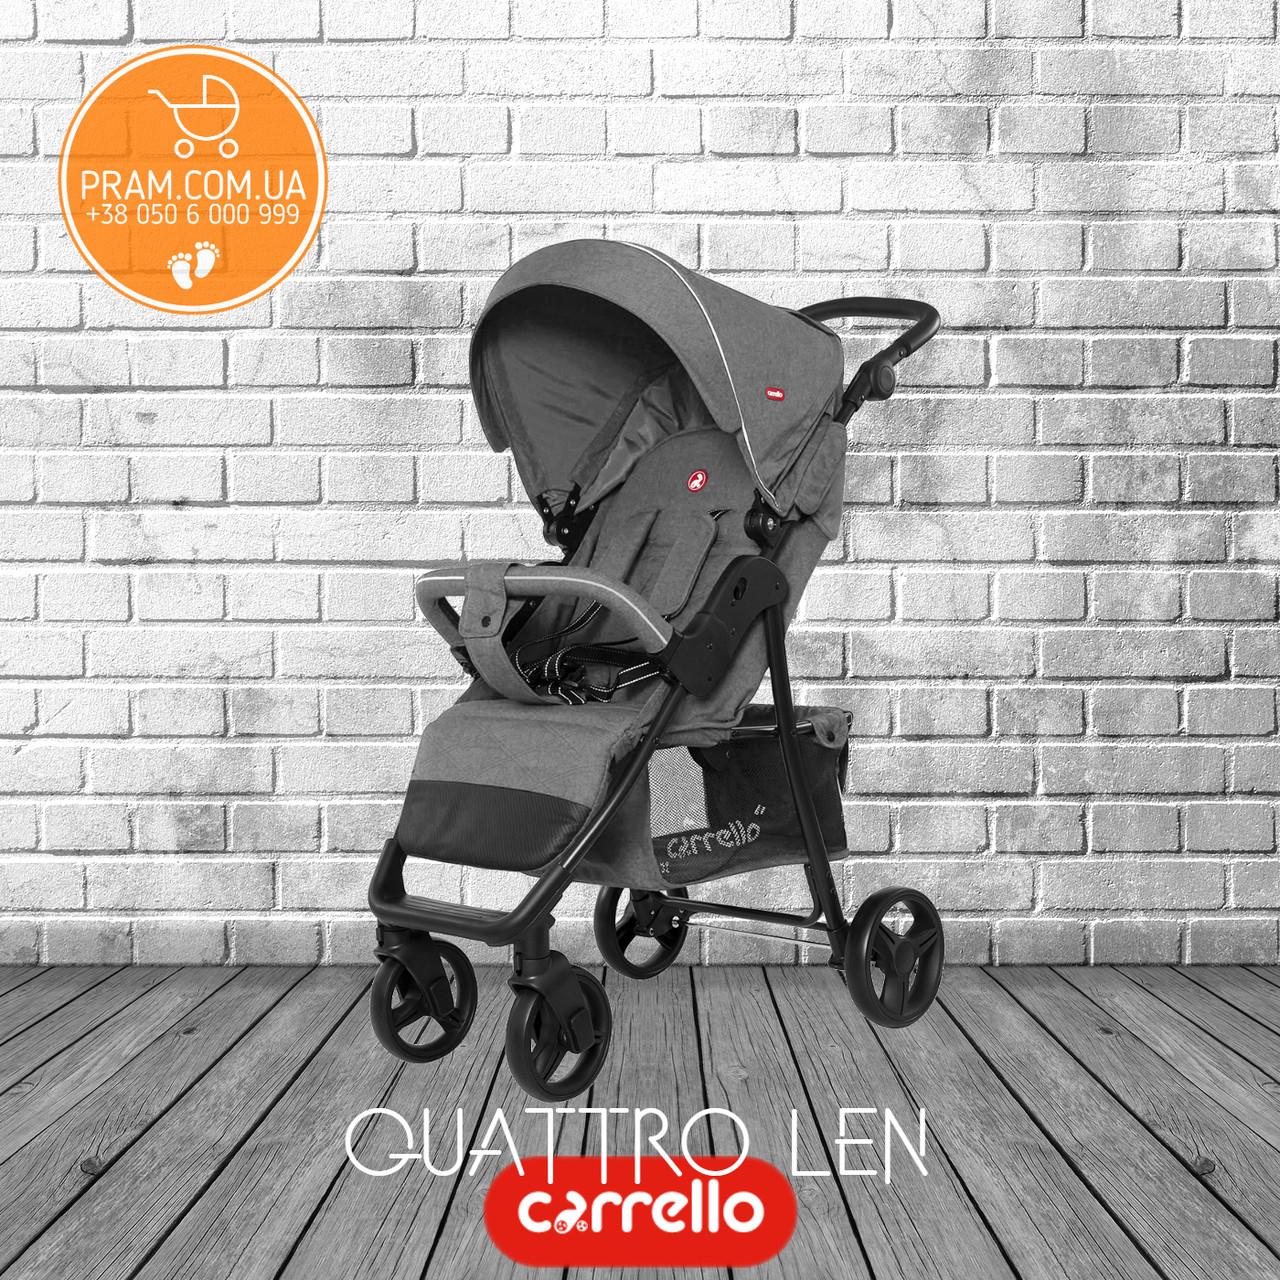 Carrello Quattro Len CRL-8502/2 2019 прогулочная коляска Shark Grey Серый